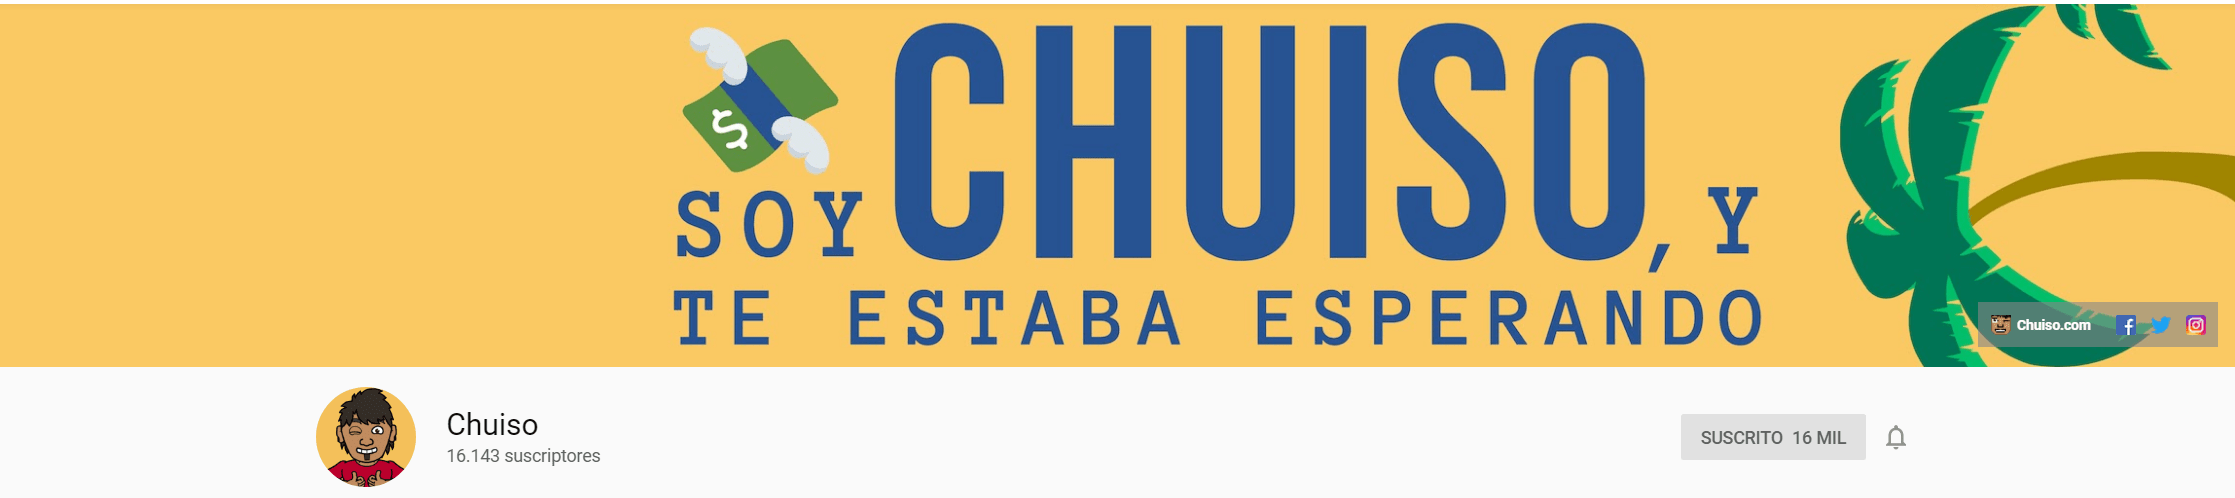 Chuiso